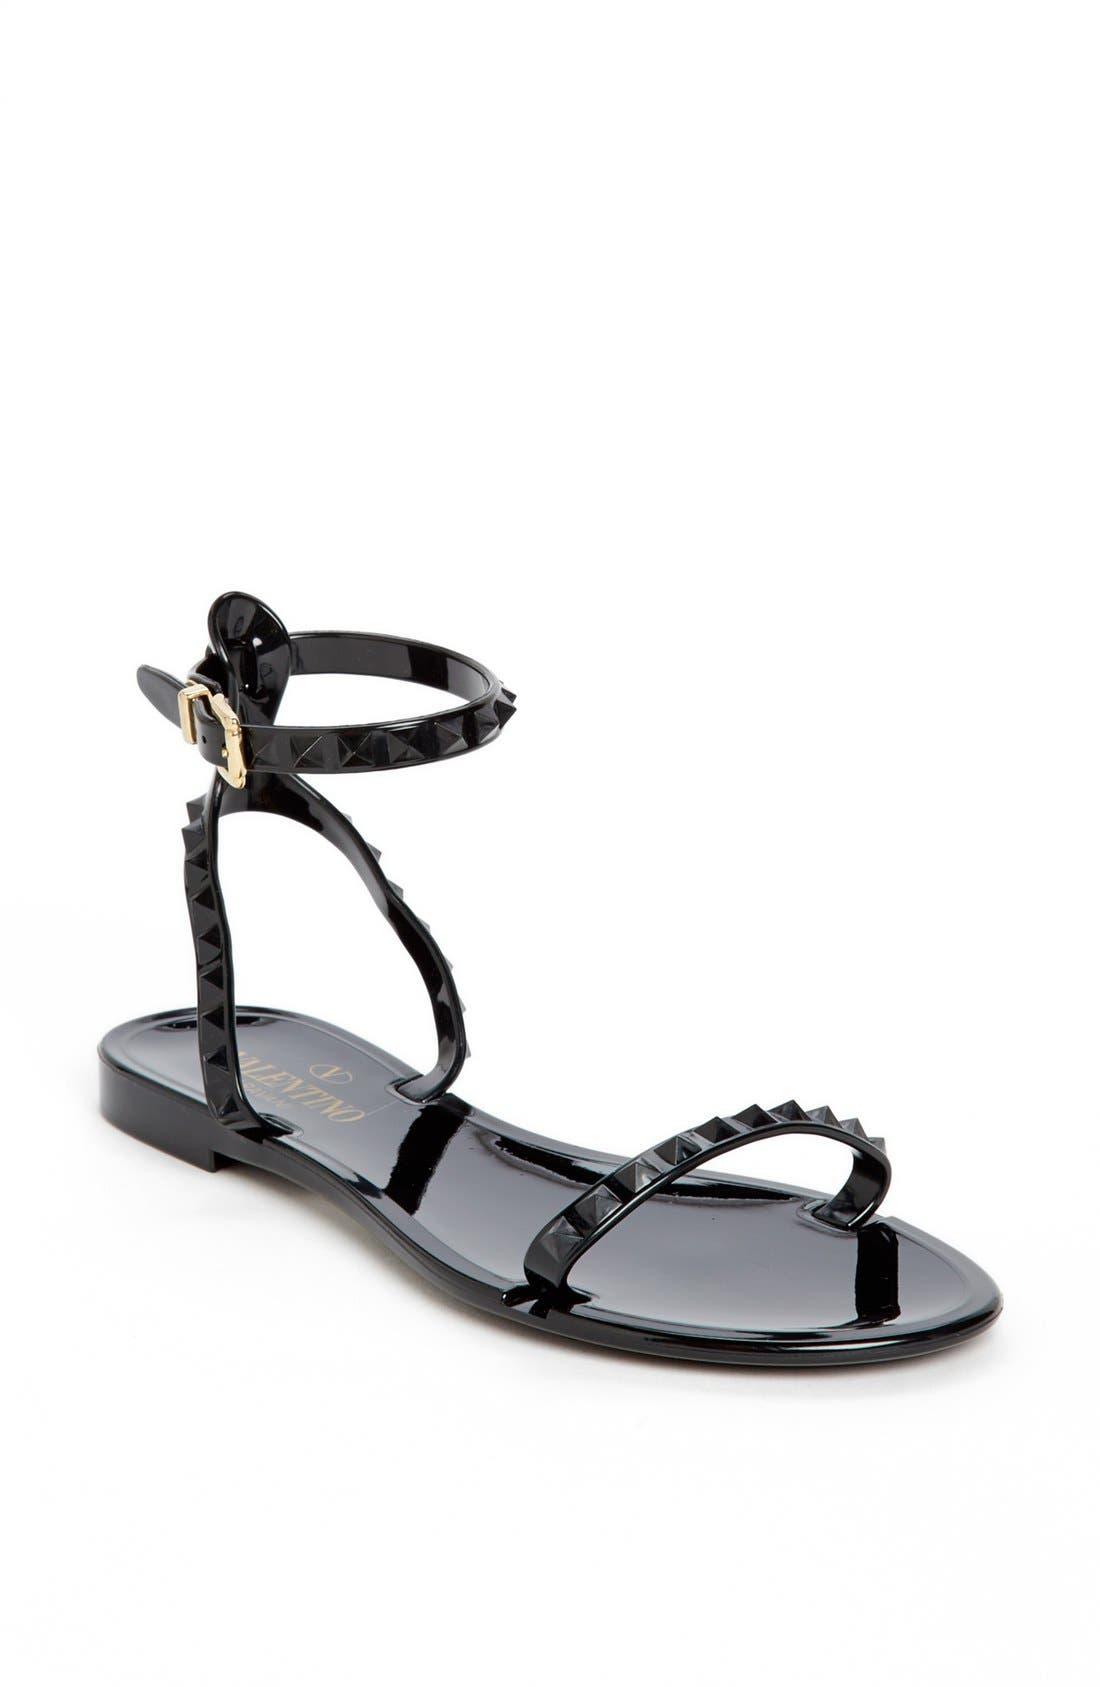 Alternate Image 1 Selected - VALENTINO GARAVANI 'Rockstud' Ankle Strap Sandal